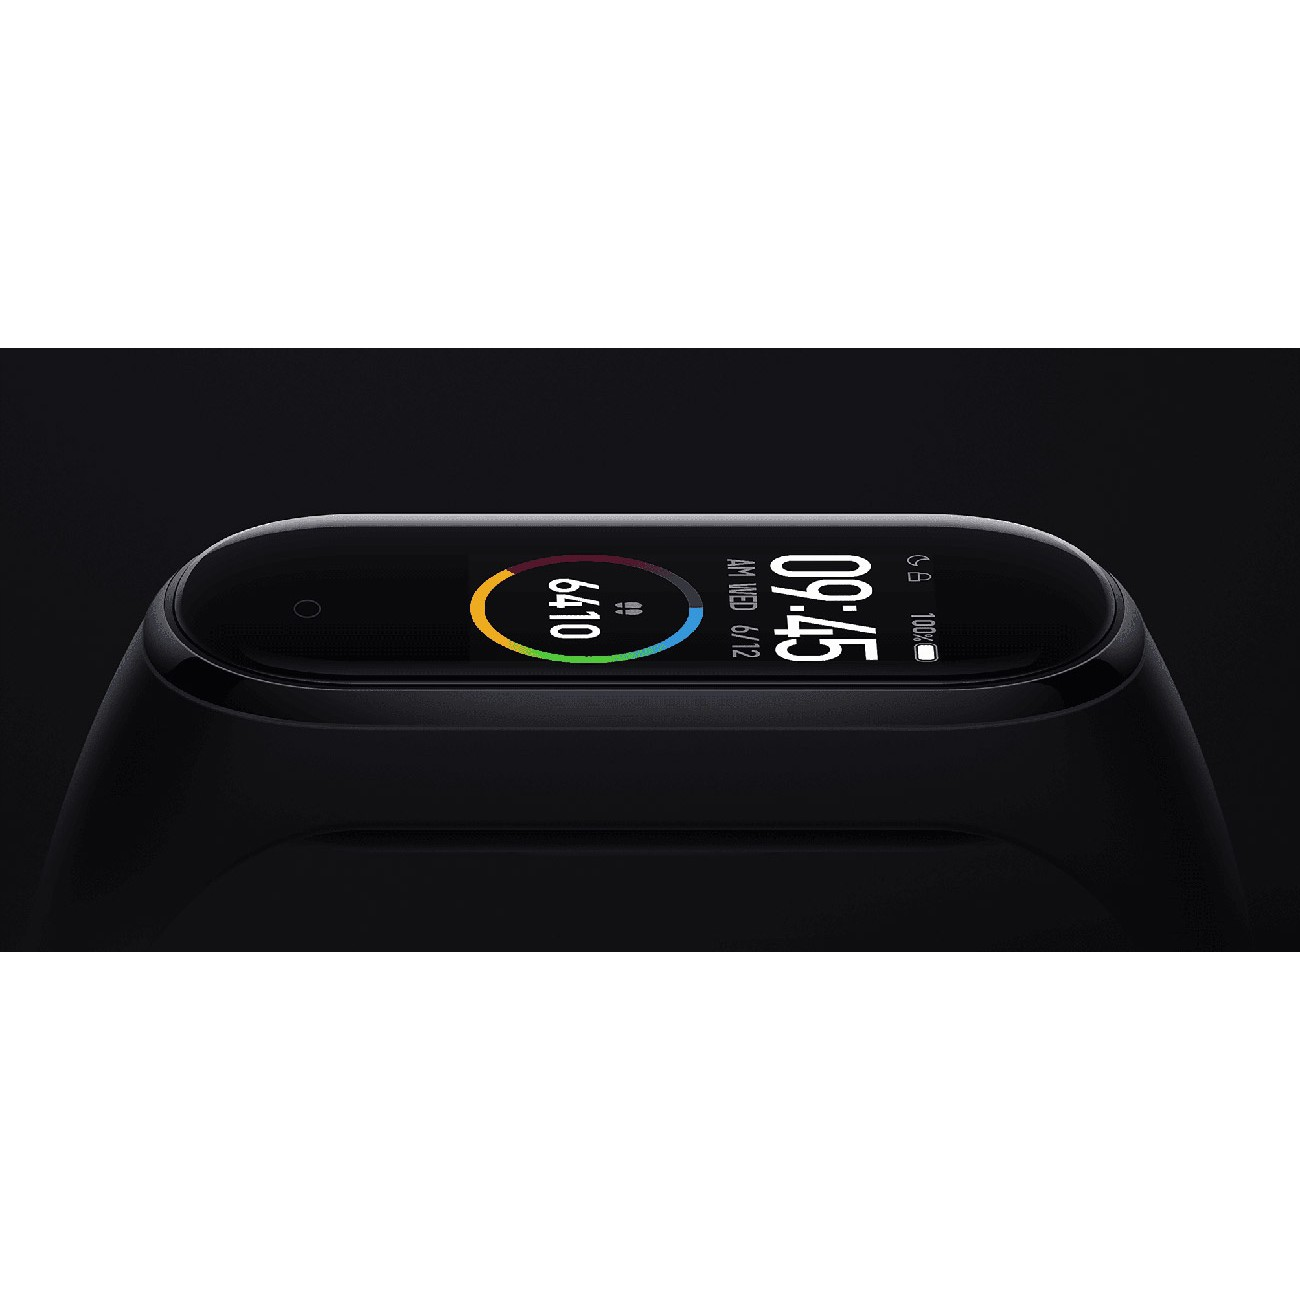 Smart náramok Xiaomi Mi Band 4 Android/iOS Bluetooth SMS akcelerometer gyroskop krokomer dotykový megamix.sk